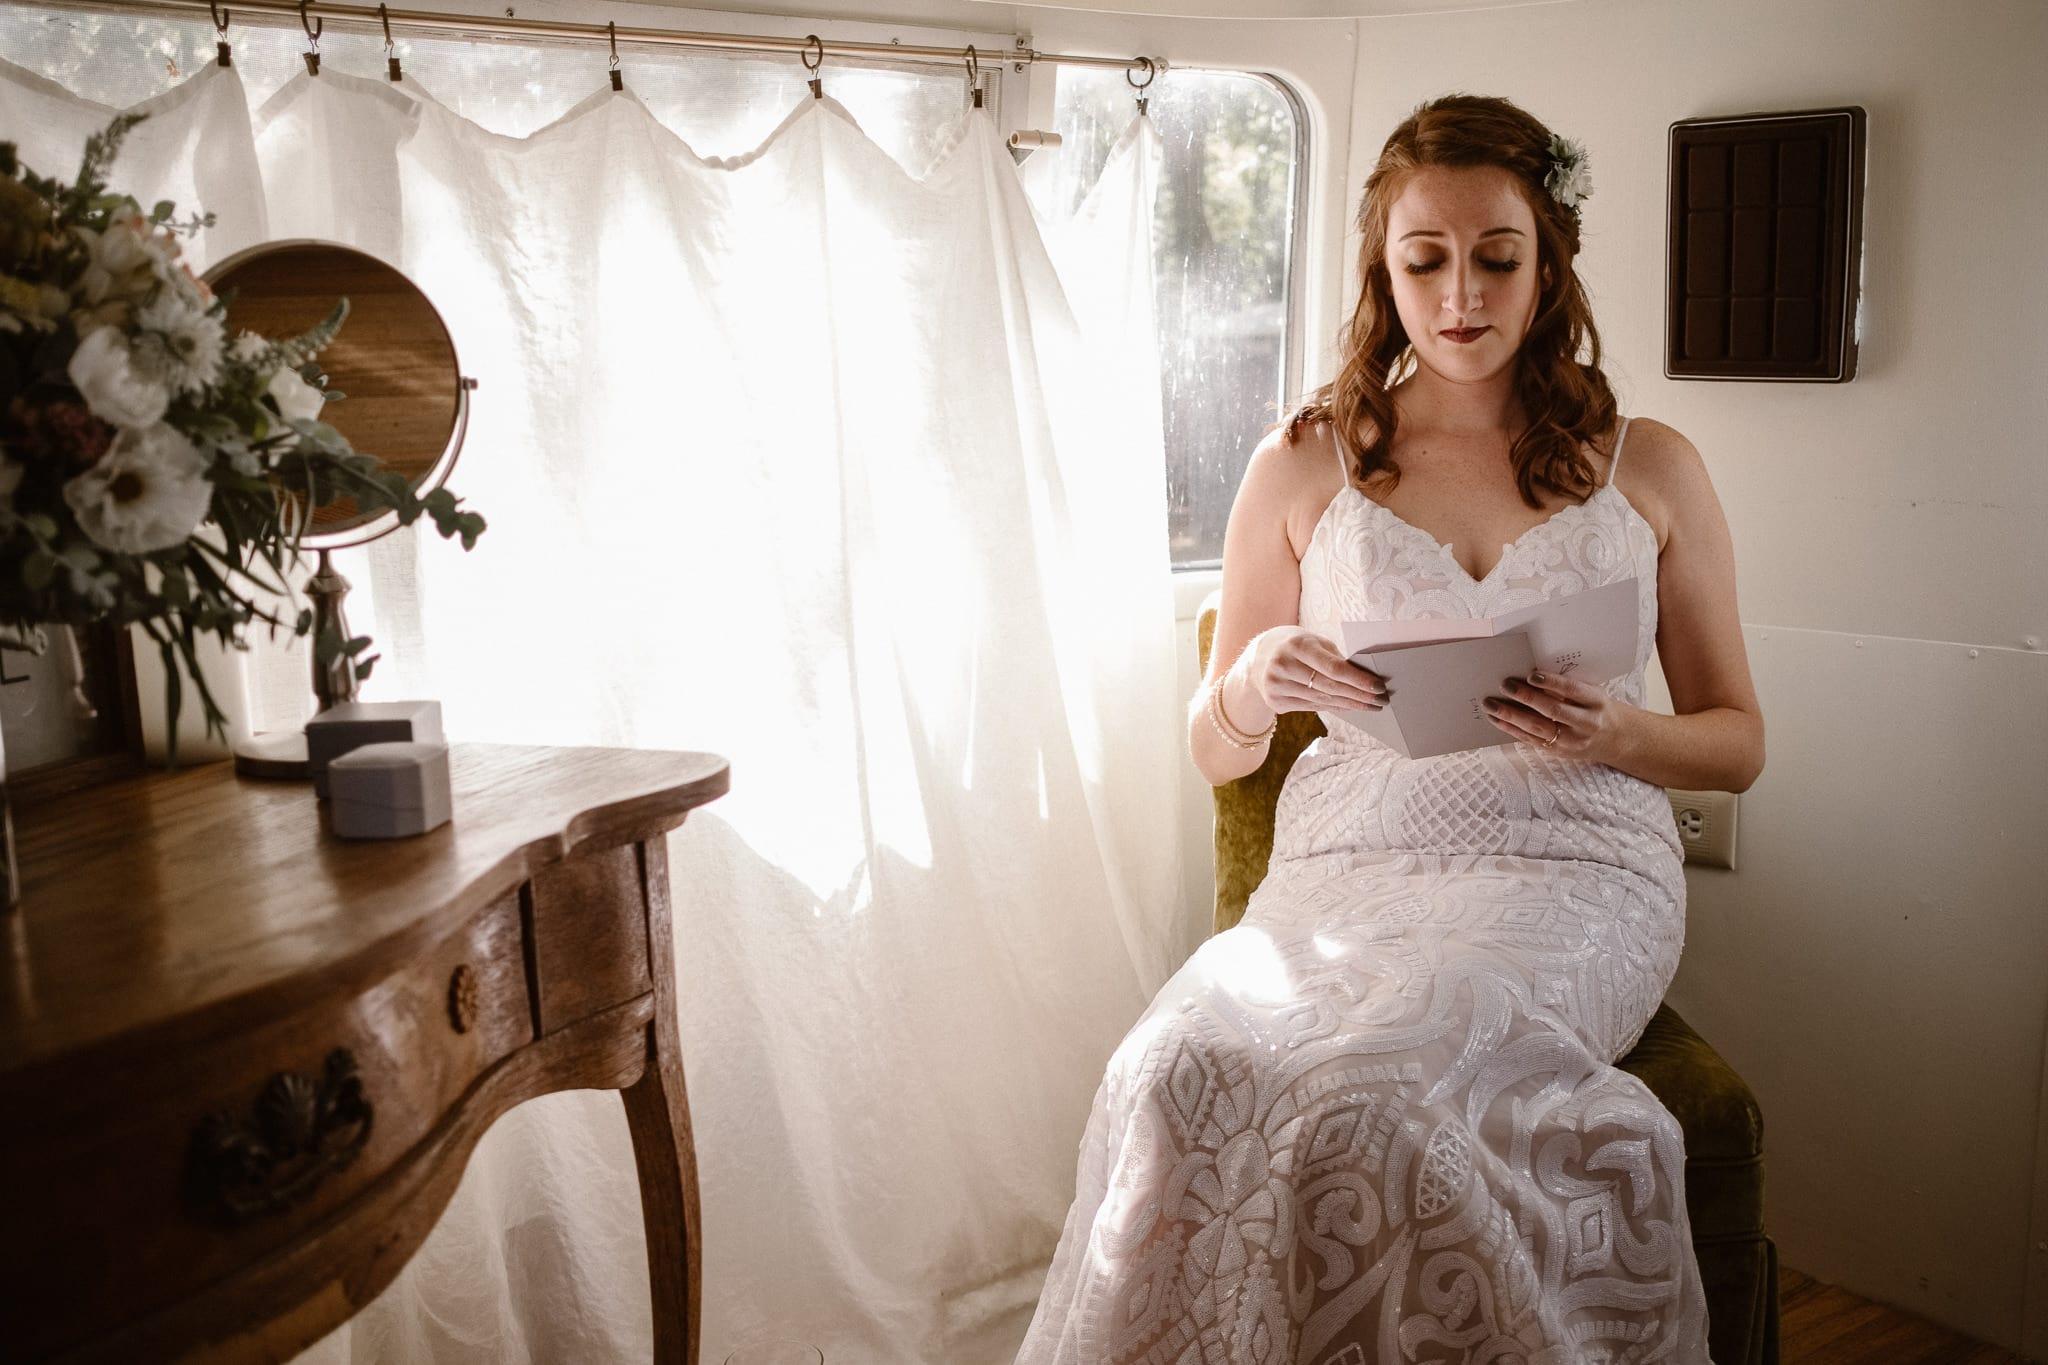 Lyons Farmette wedding photographer, Colorado intimate wedding photographer, bride getting ready in airstream, bride reading letter